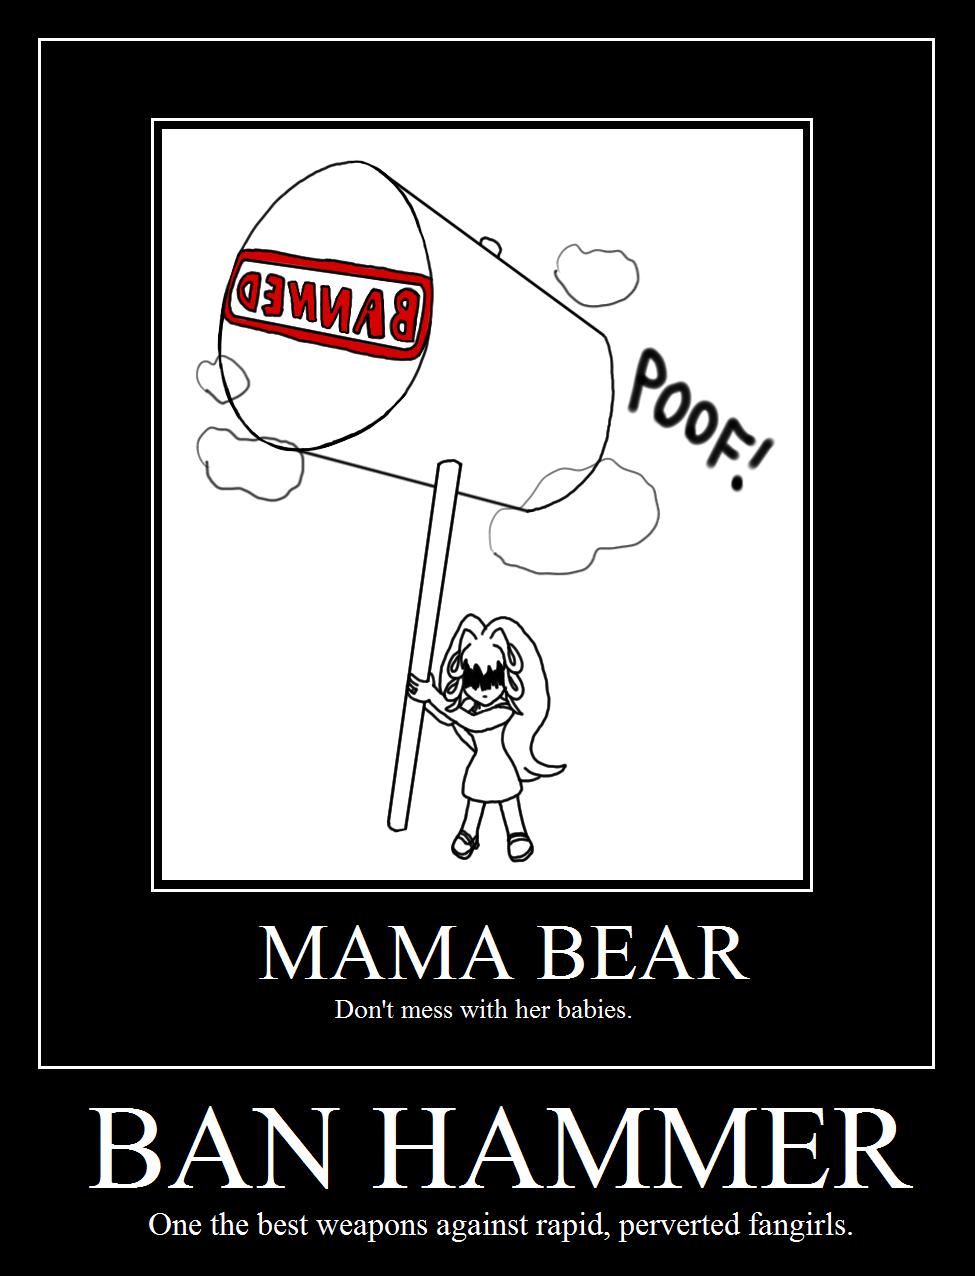 Motivational Poster - Mama Bear